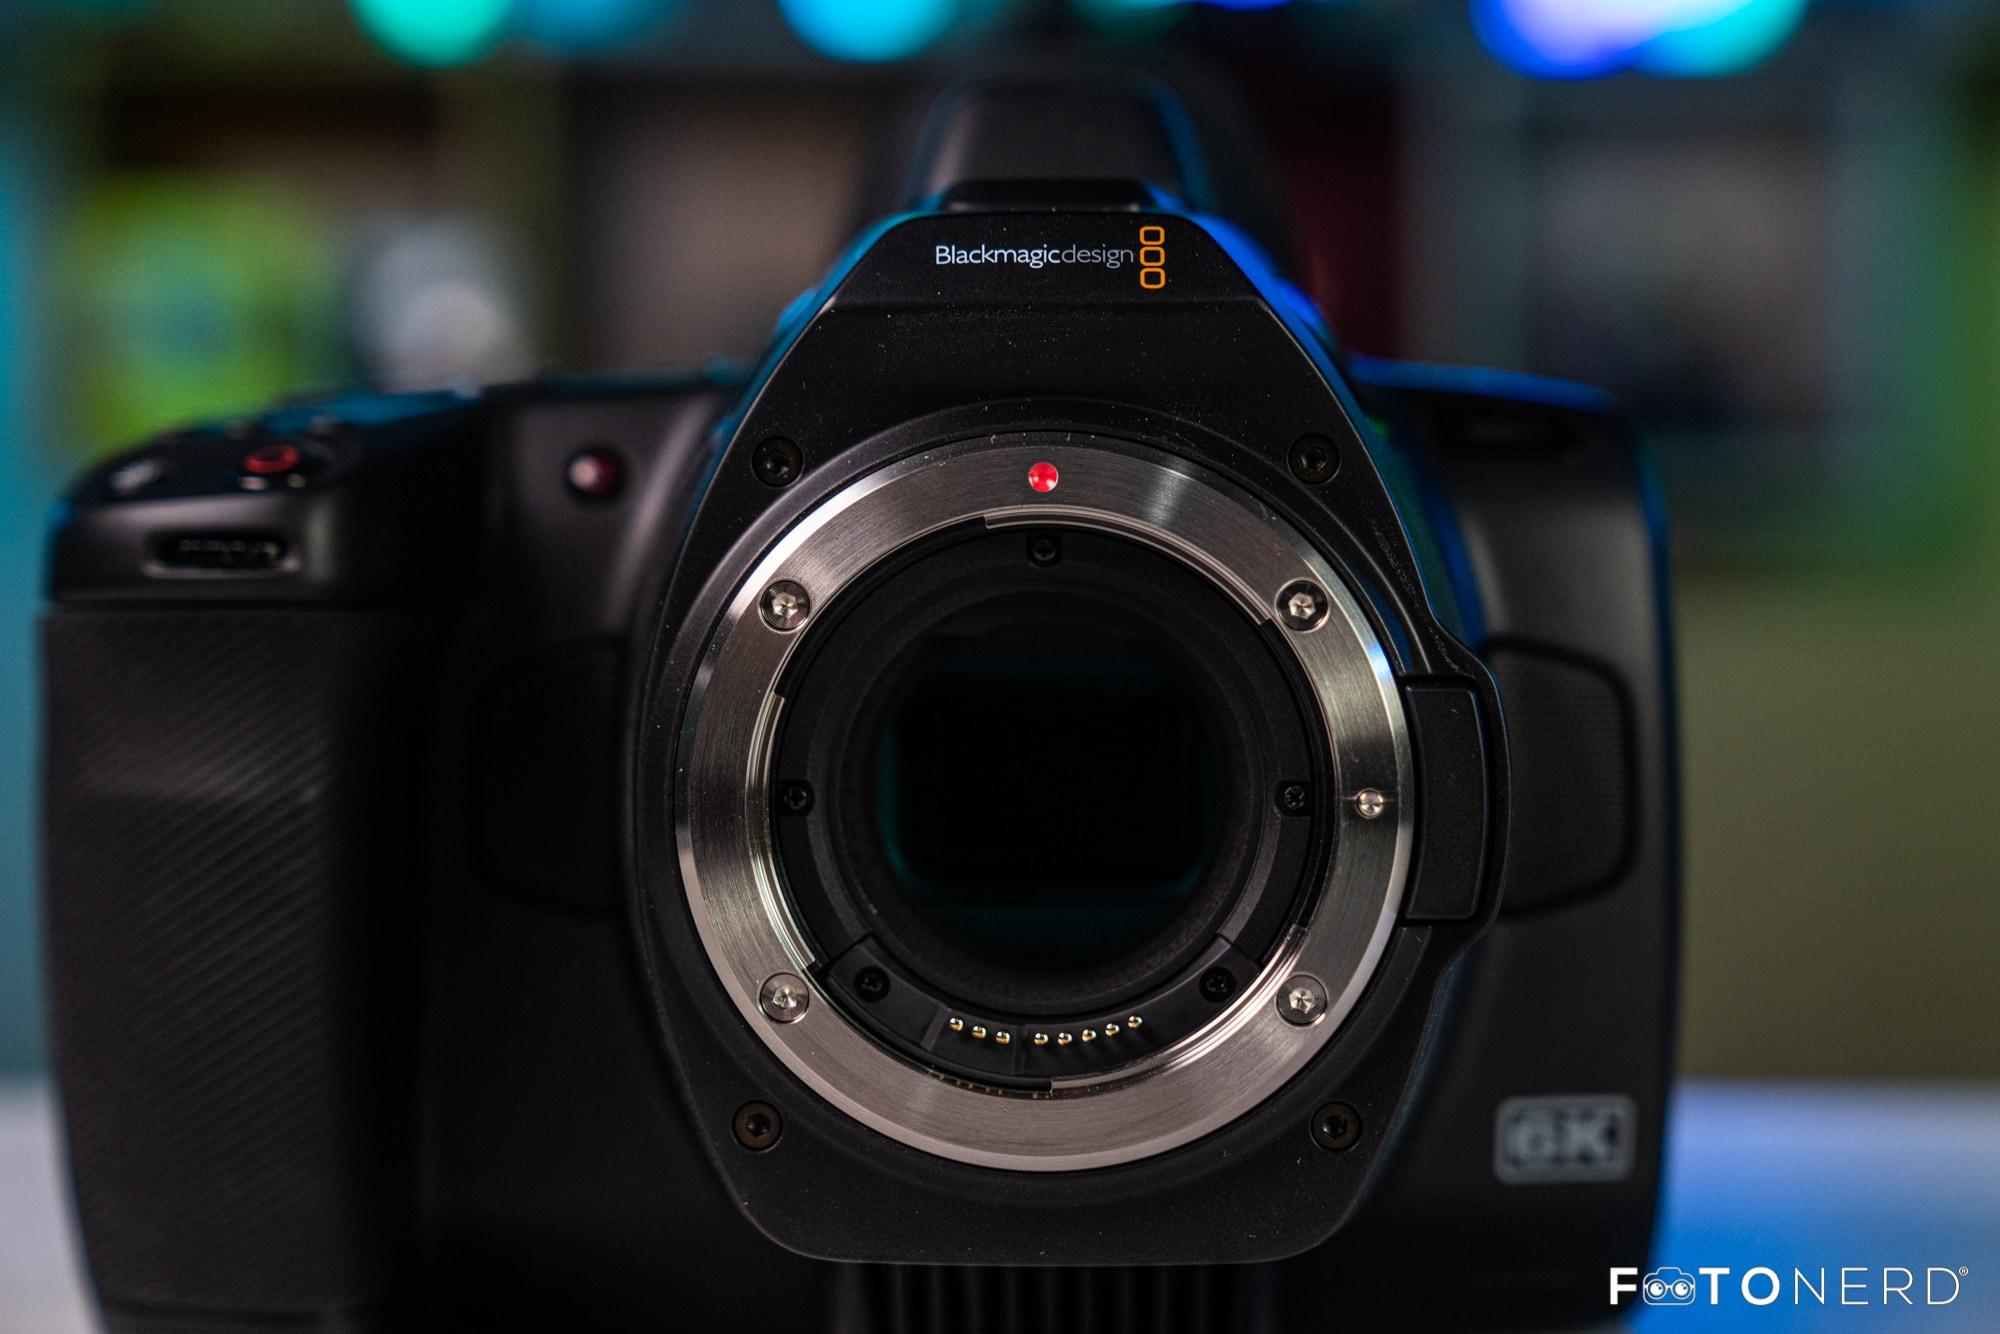 Blackmagic Pocket Cinema Camera 6K Pro